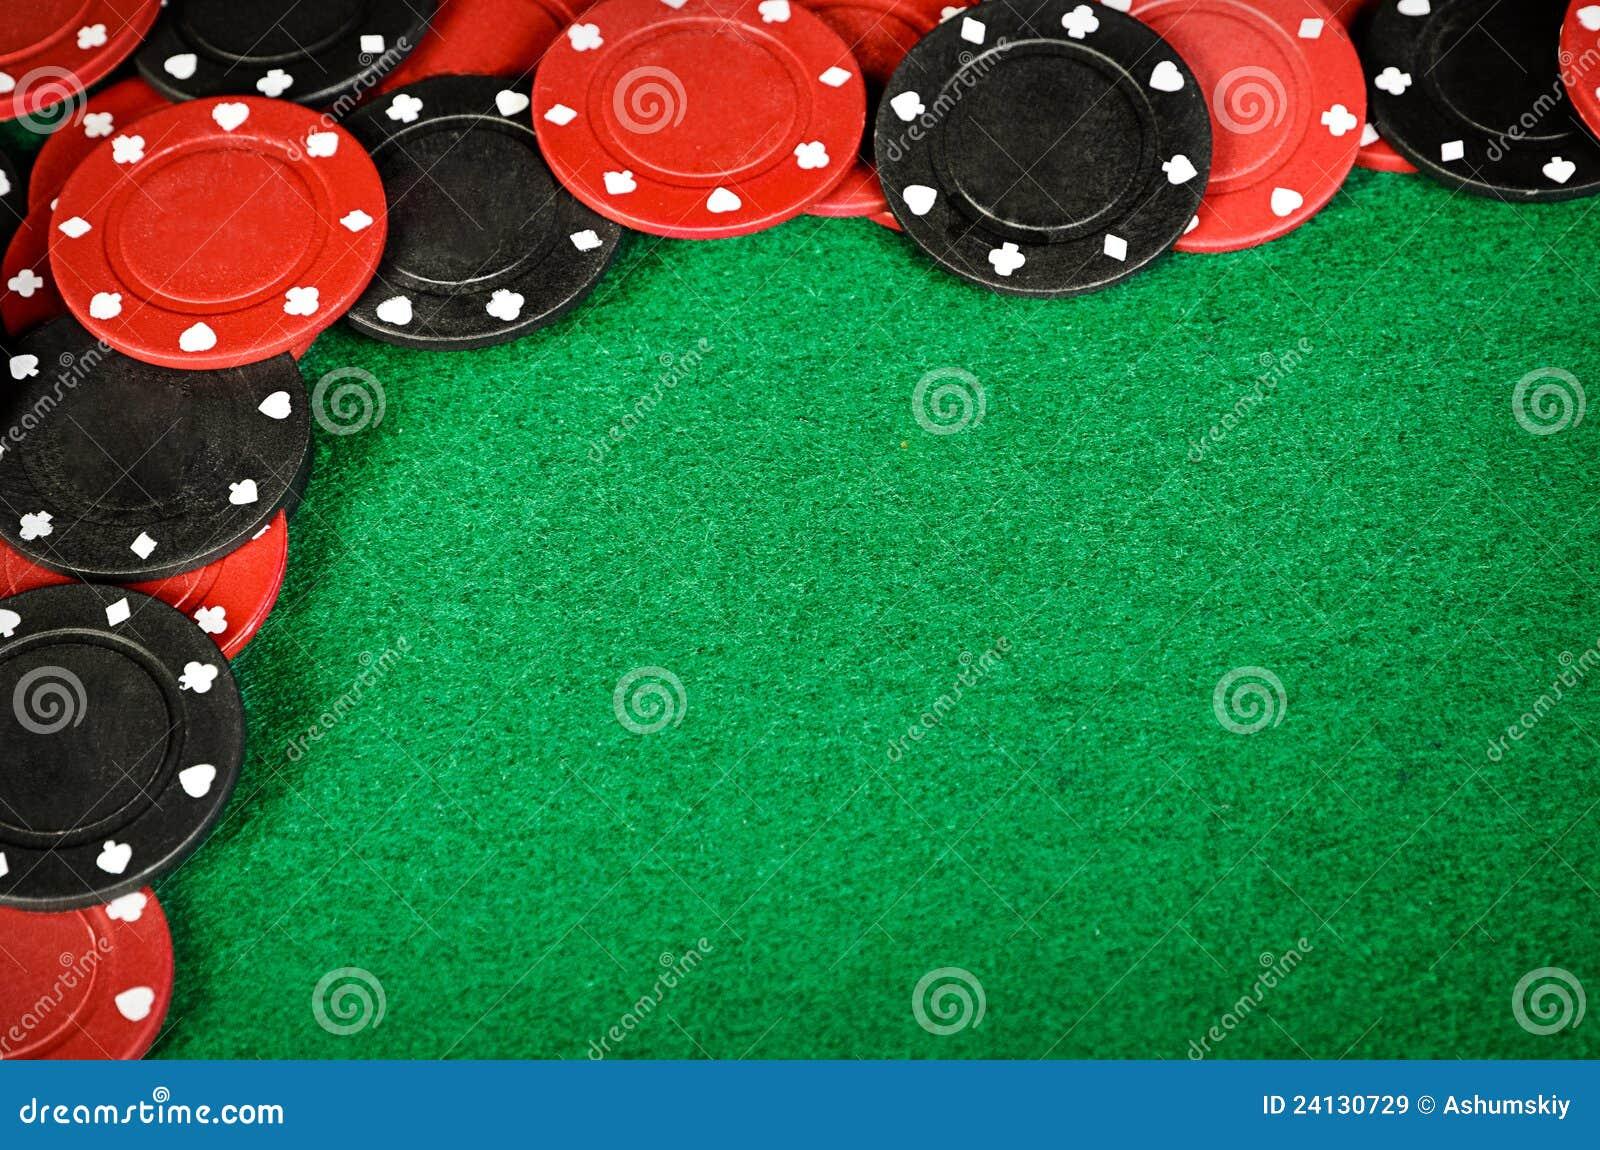 Red or black gambling treatment for compulsive gambling addiction